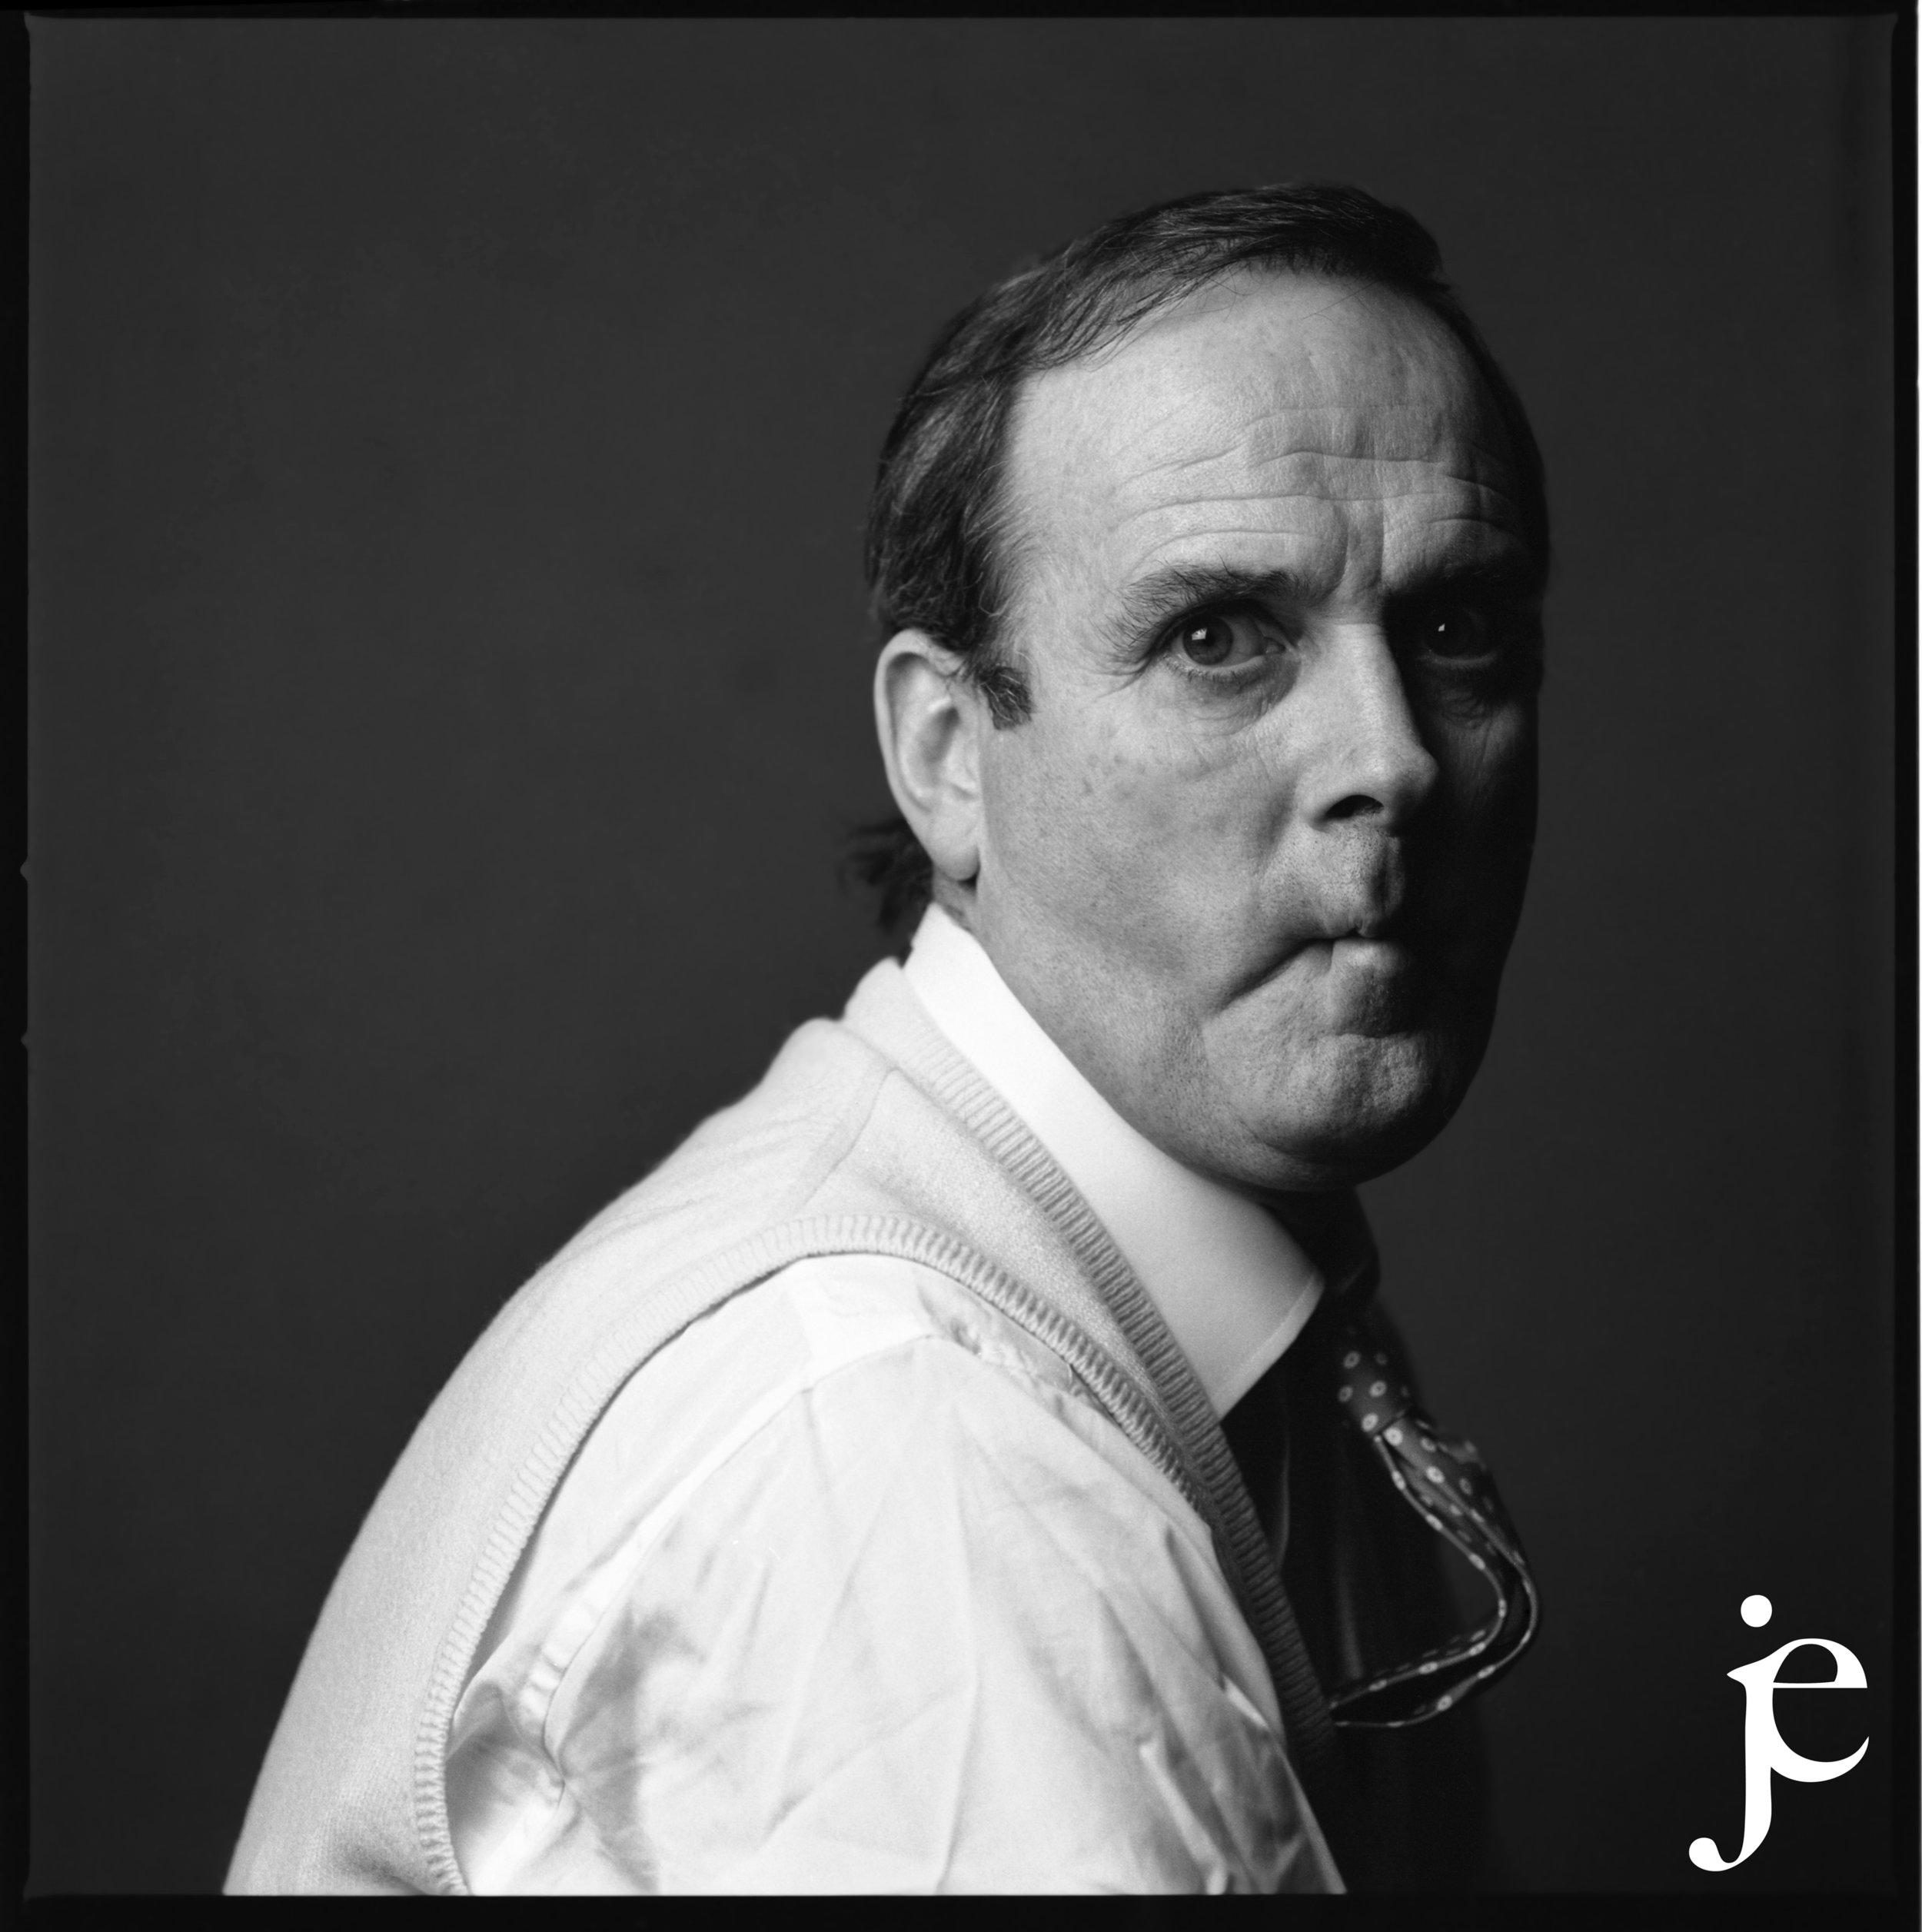 John Cleese, Groucho Club, London, 1988